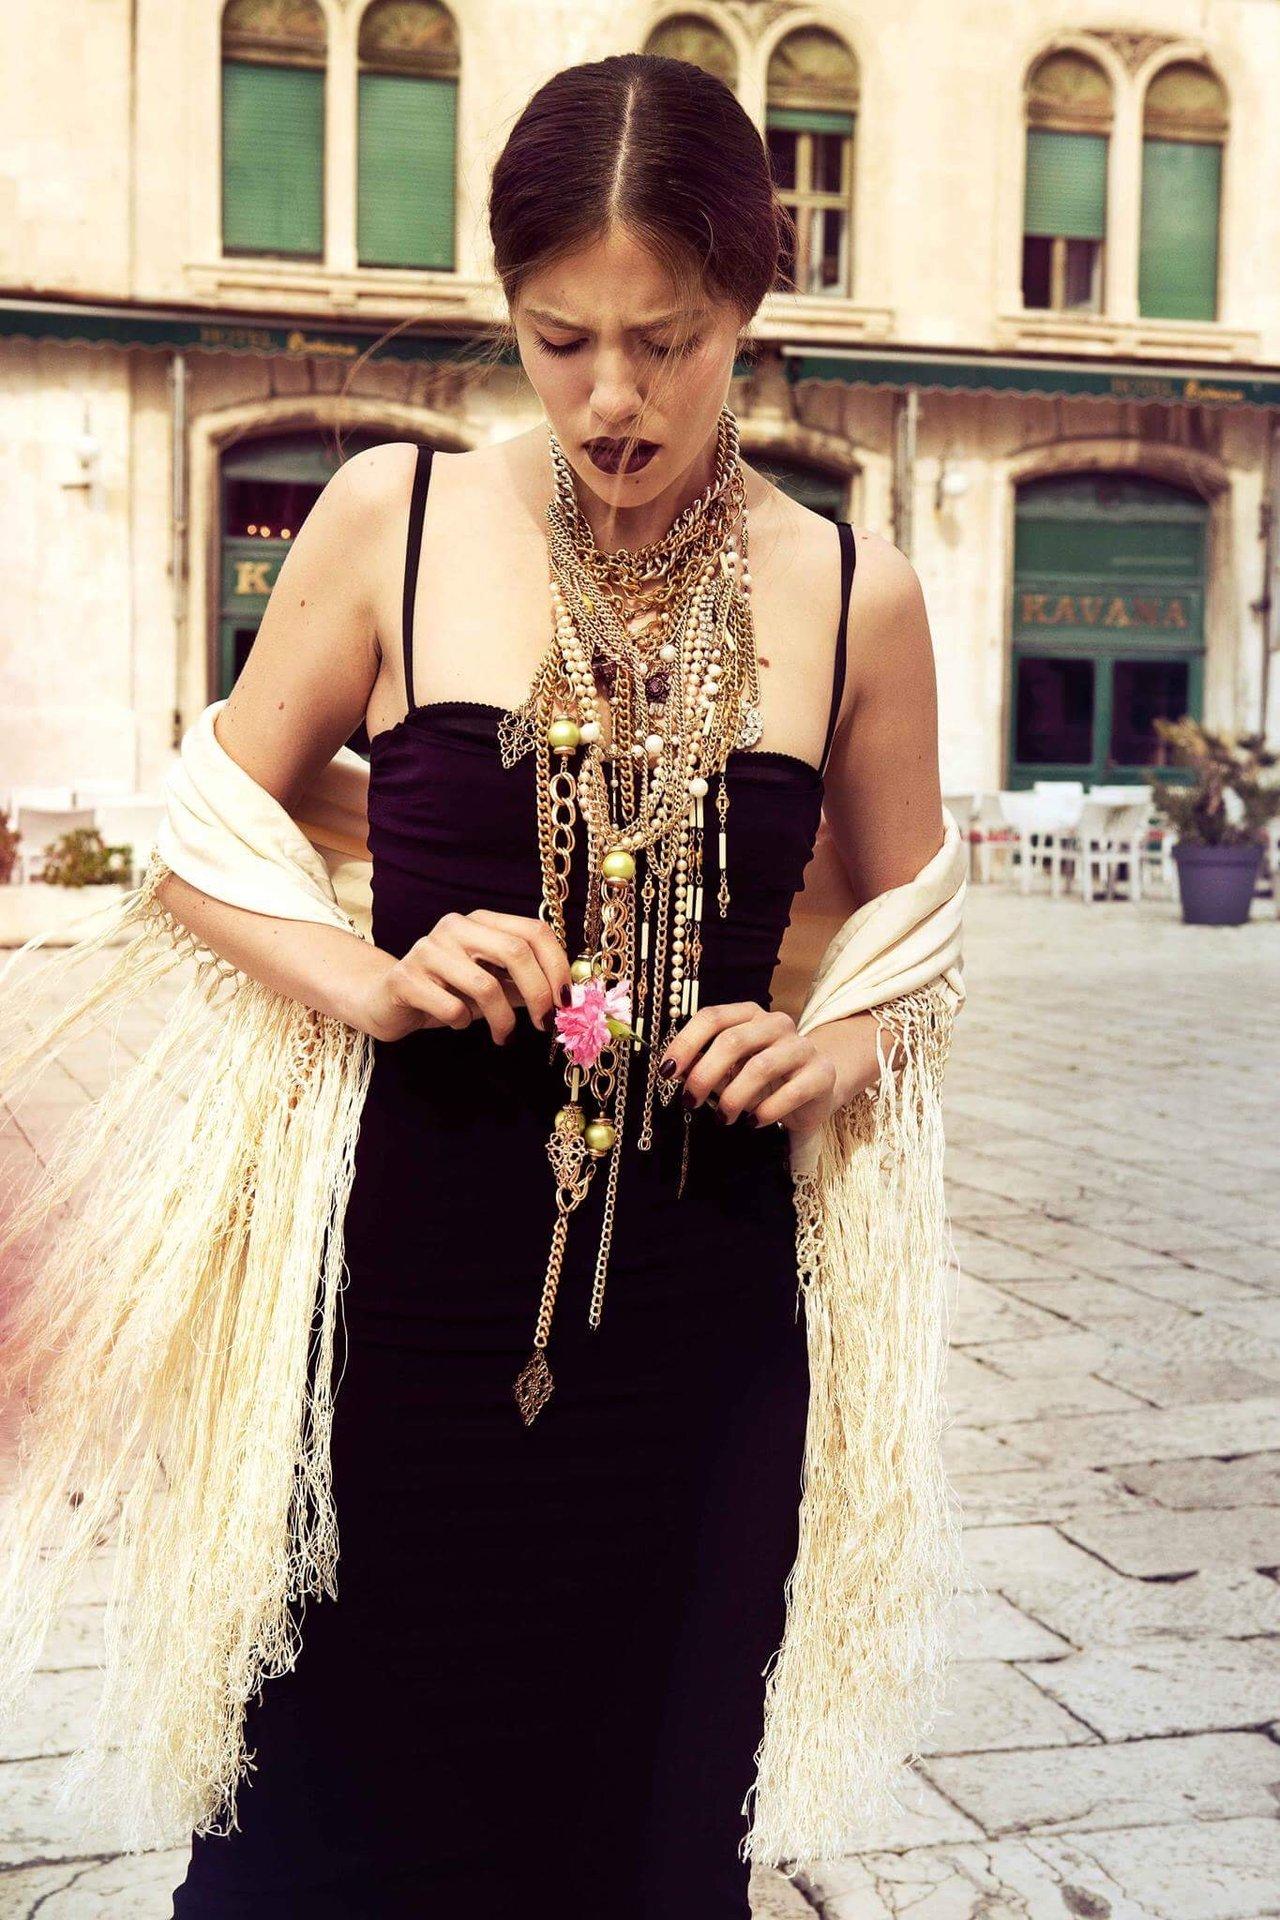 LA PLUS BELLE MAGAZINE l Hair, Makeup & Nails: Melanie Volkart Styling: Letizia Abbatiello Photographer: Ellin Anderegg Model: Barbara @ Megamodels Hamburg